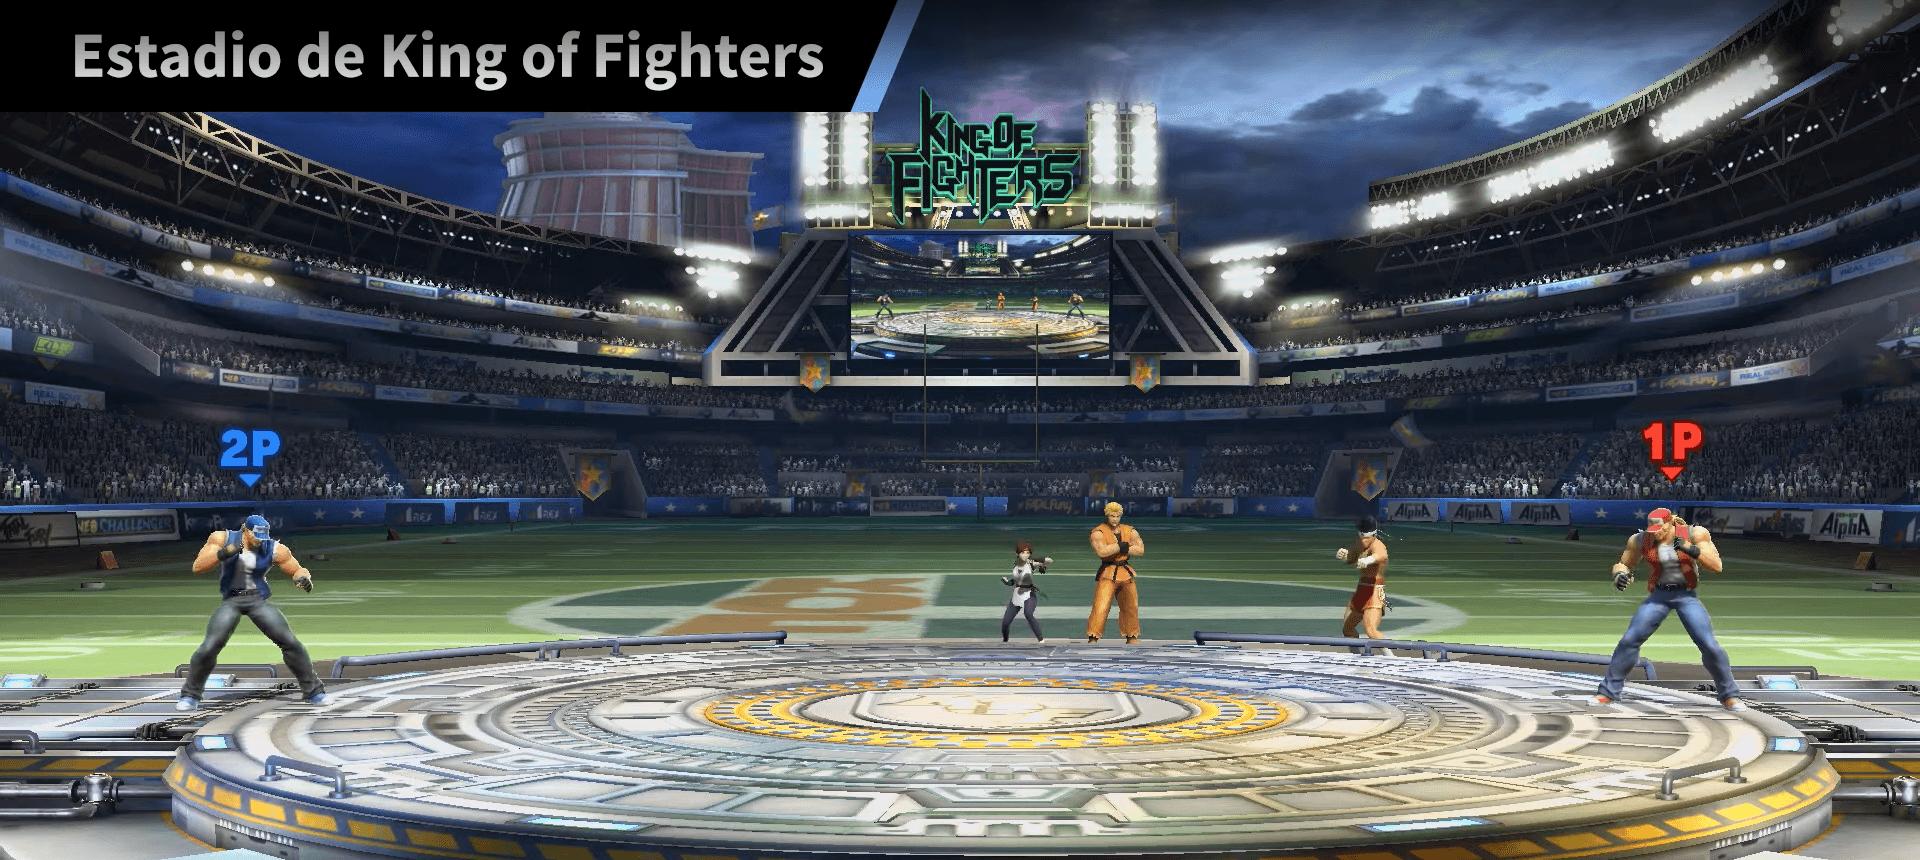 King of Fighters Stadium